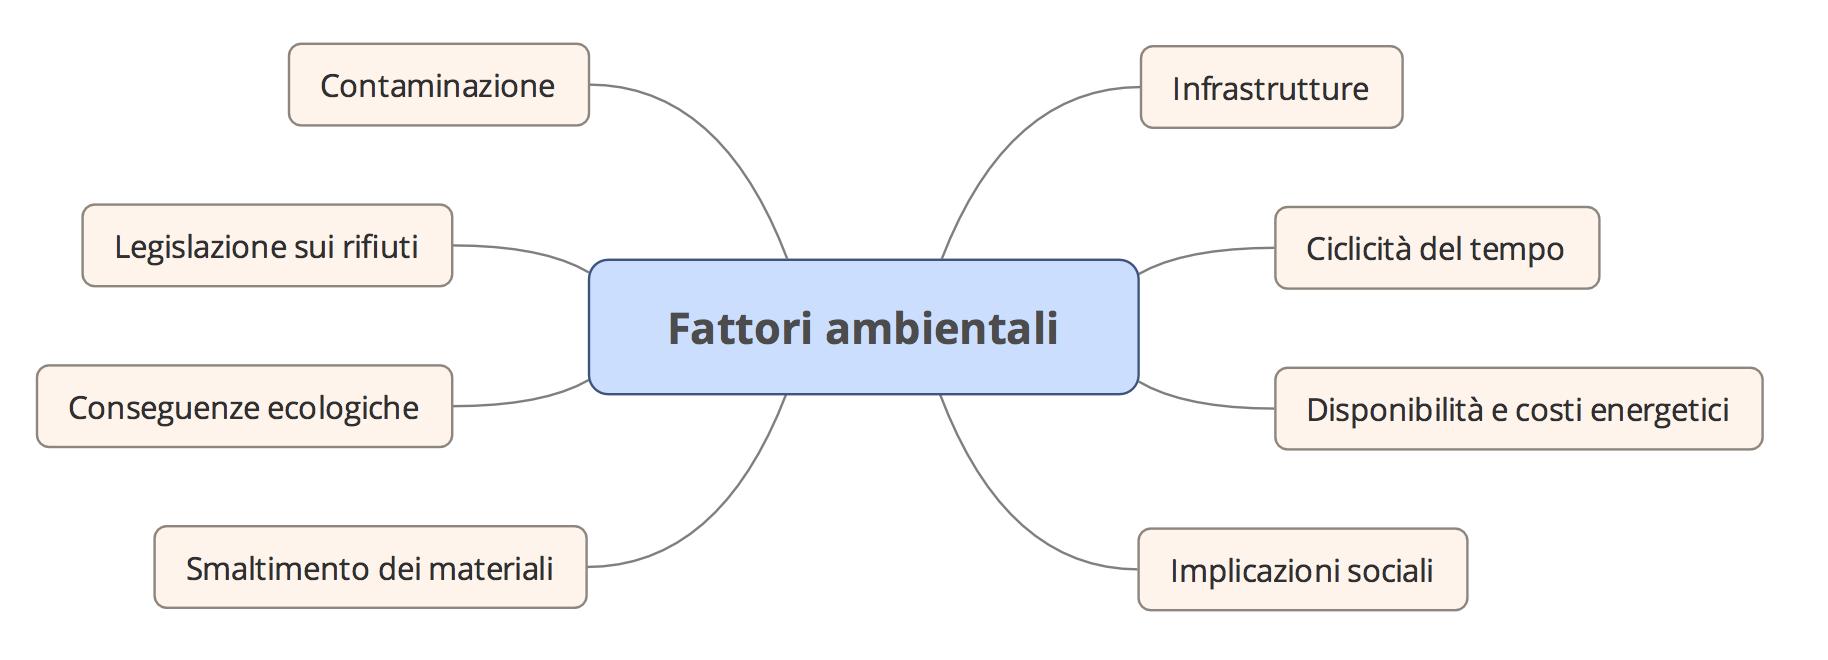 Analisi PEST fattori ambientali